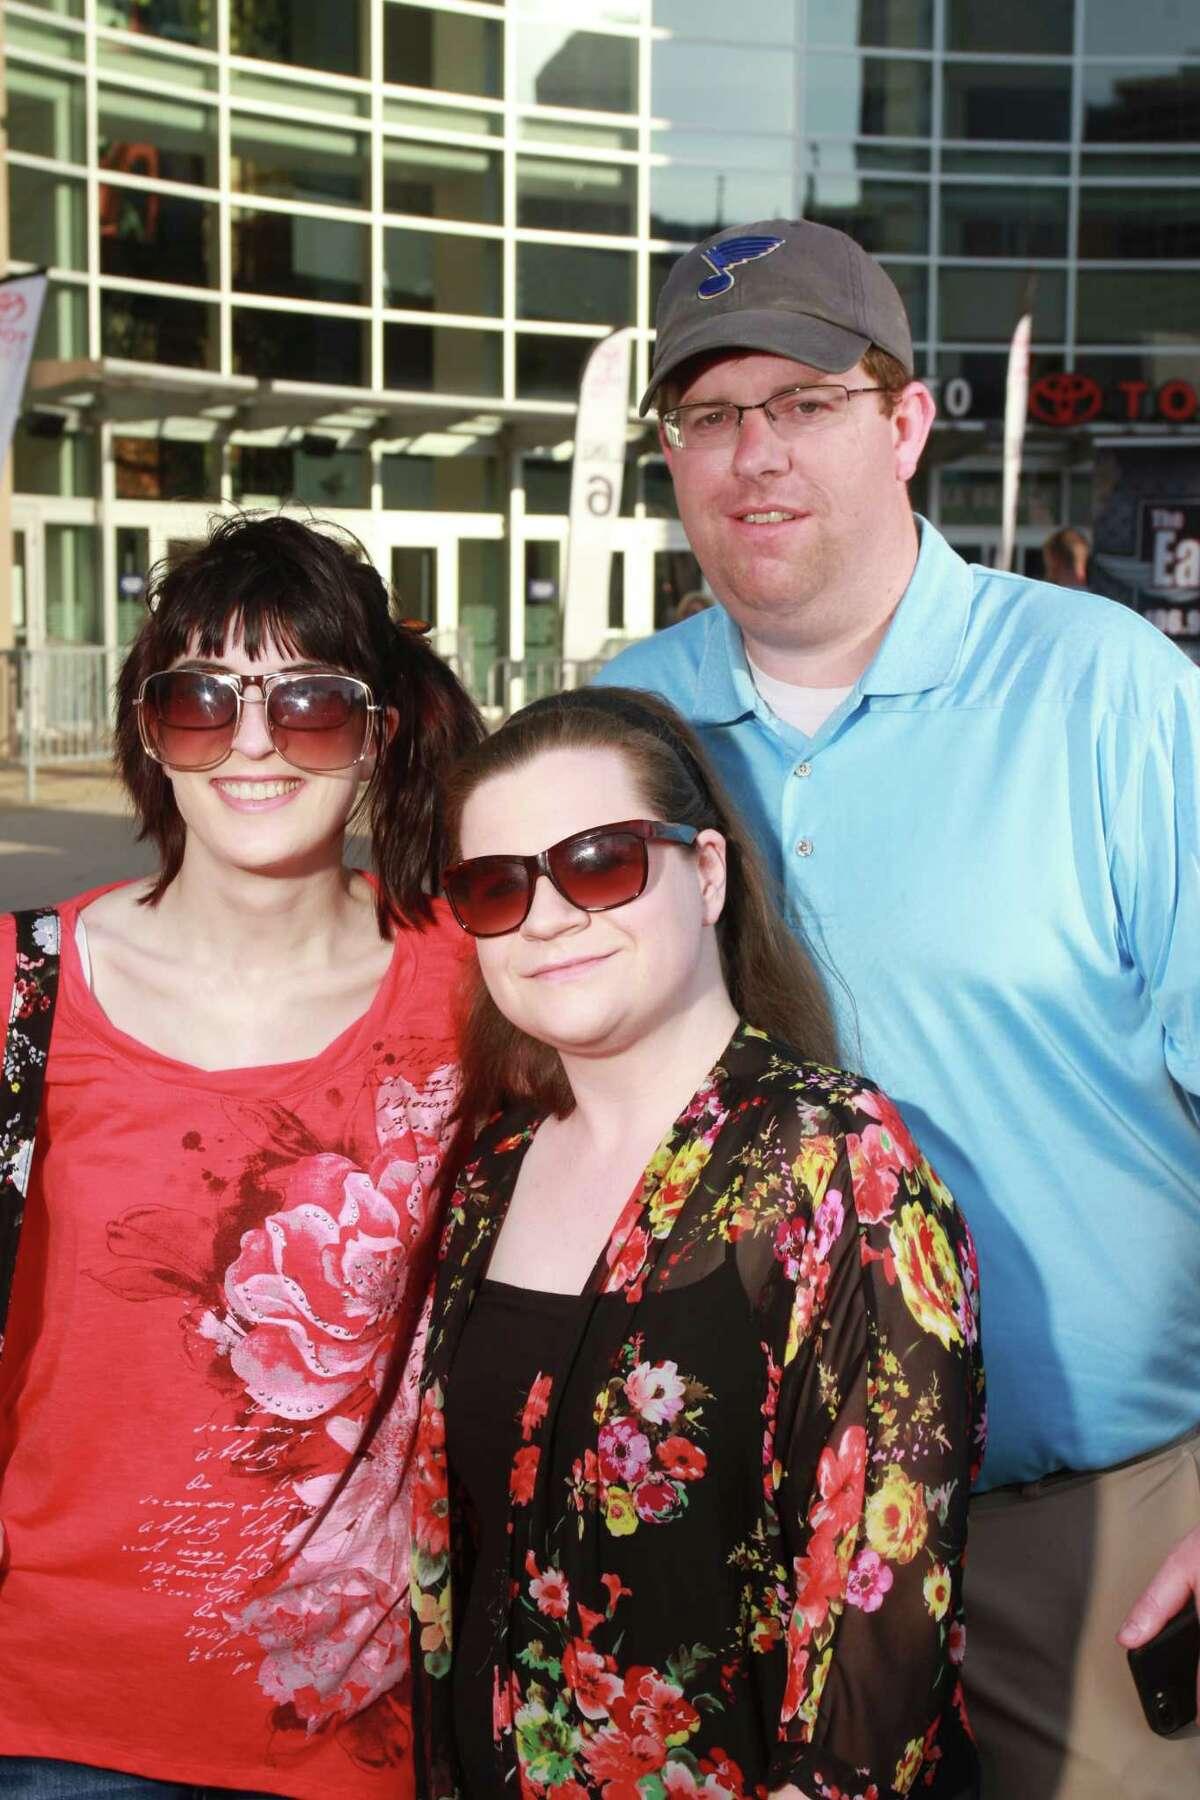 Fans attending the Paul Simon Homeward Bound tour concert at Toyota Center.